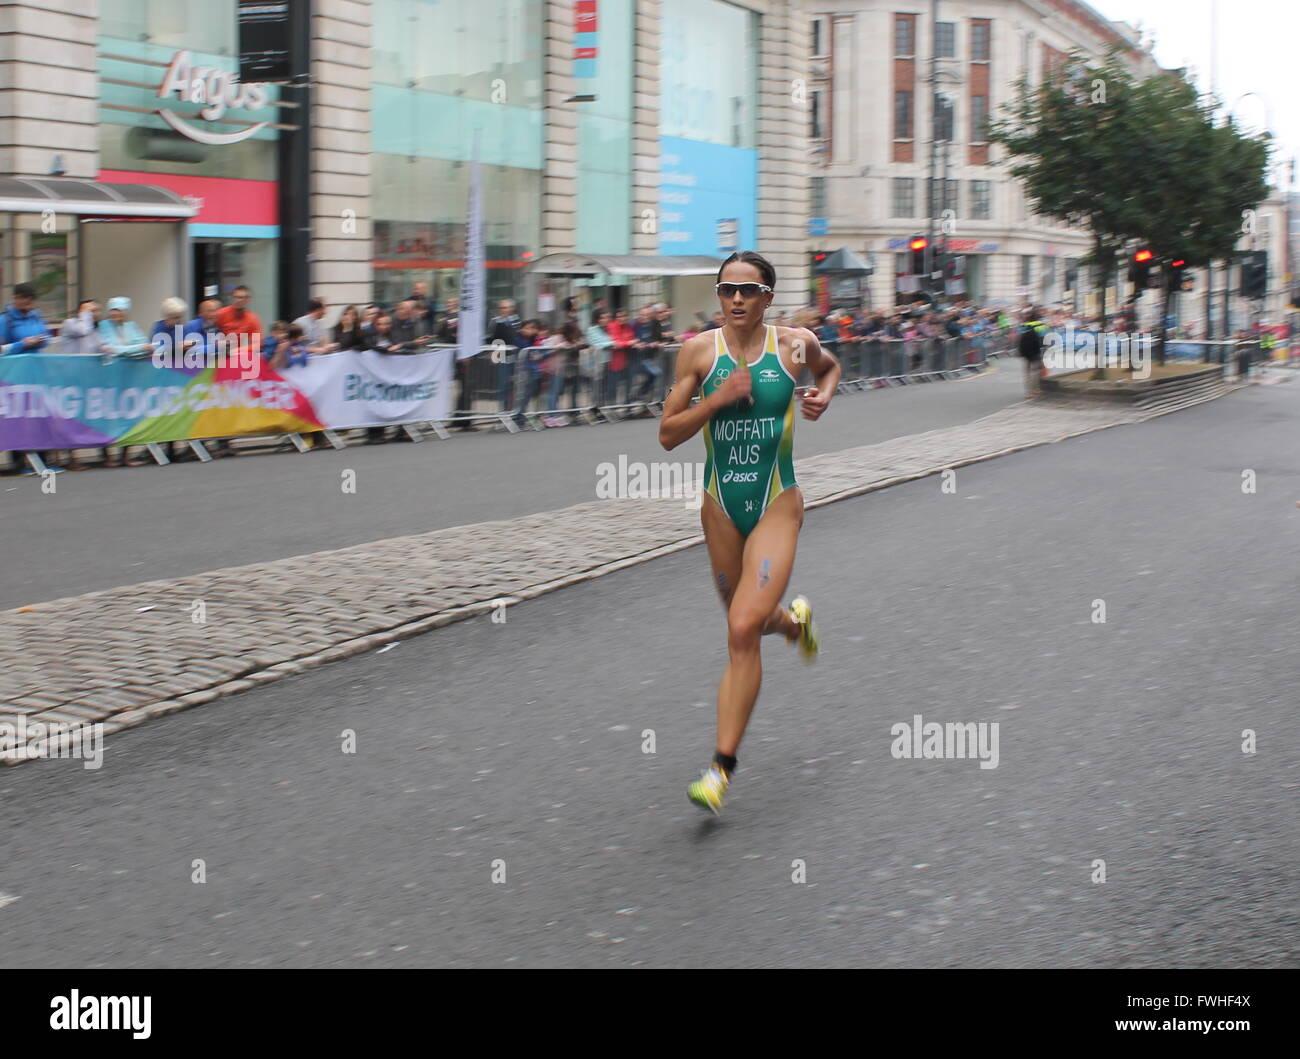 ITU World Triathlon Series - Elite Women - Leeds - Stock Image